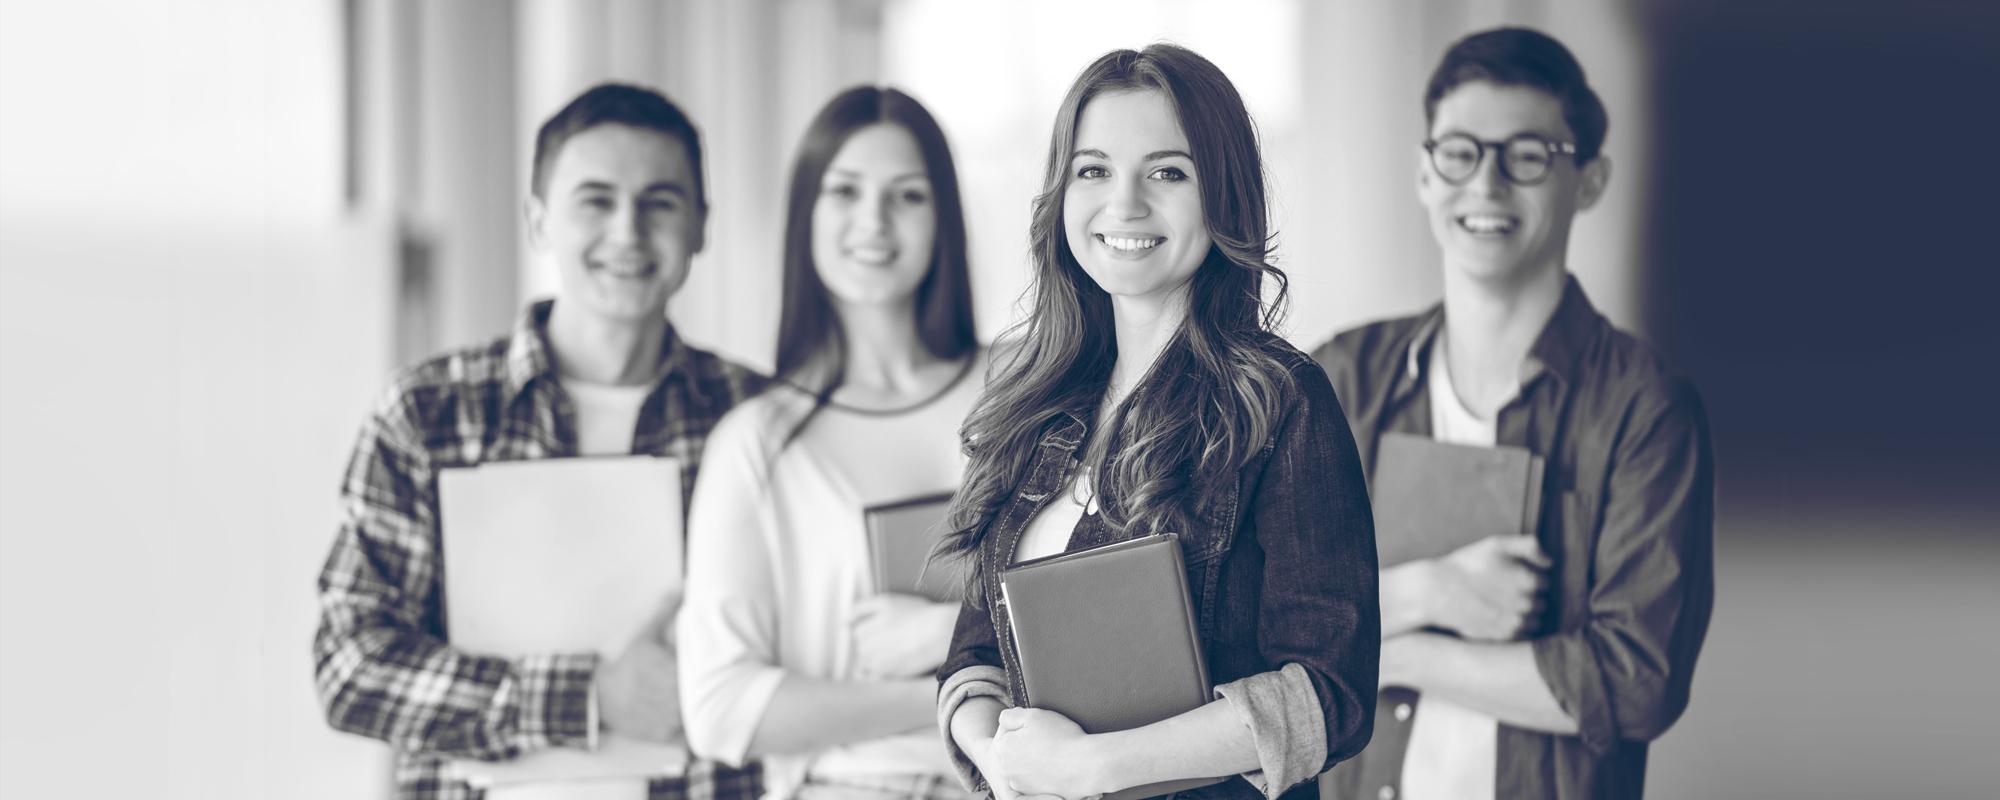 Diploma Program in Business Administration - Westford University College UAE   KSA